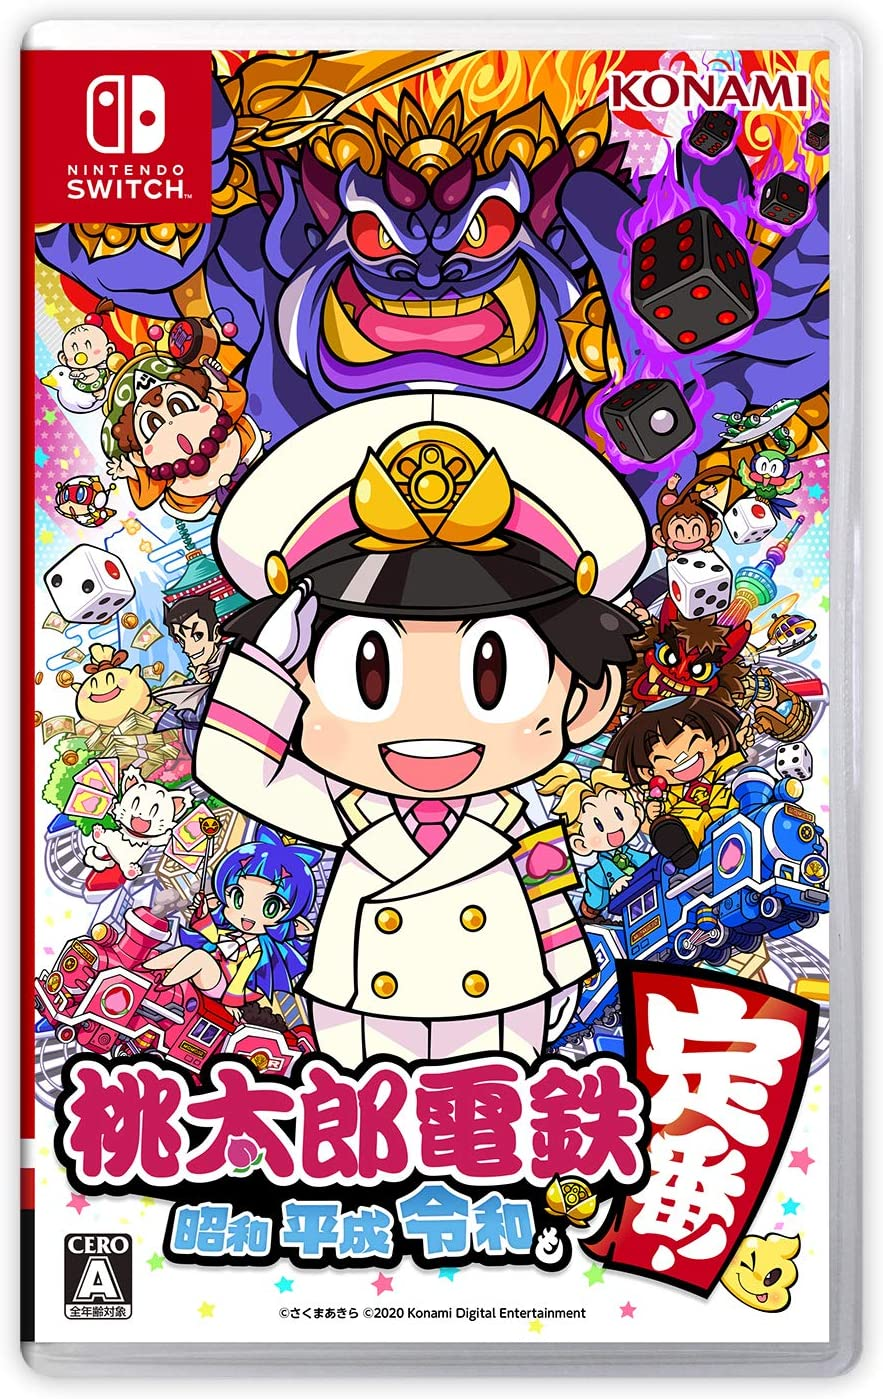 momotaro-dentetsu-game-image